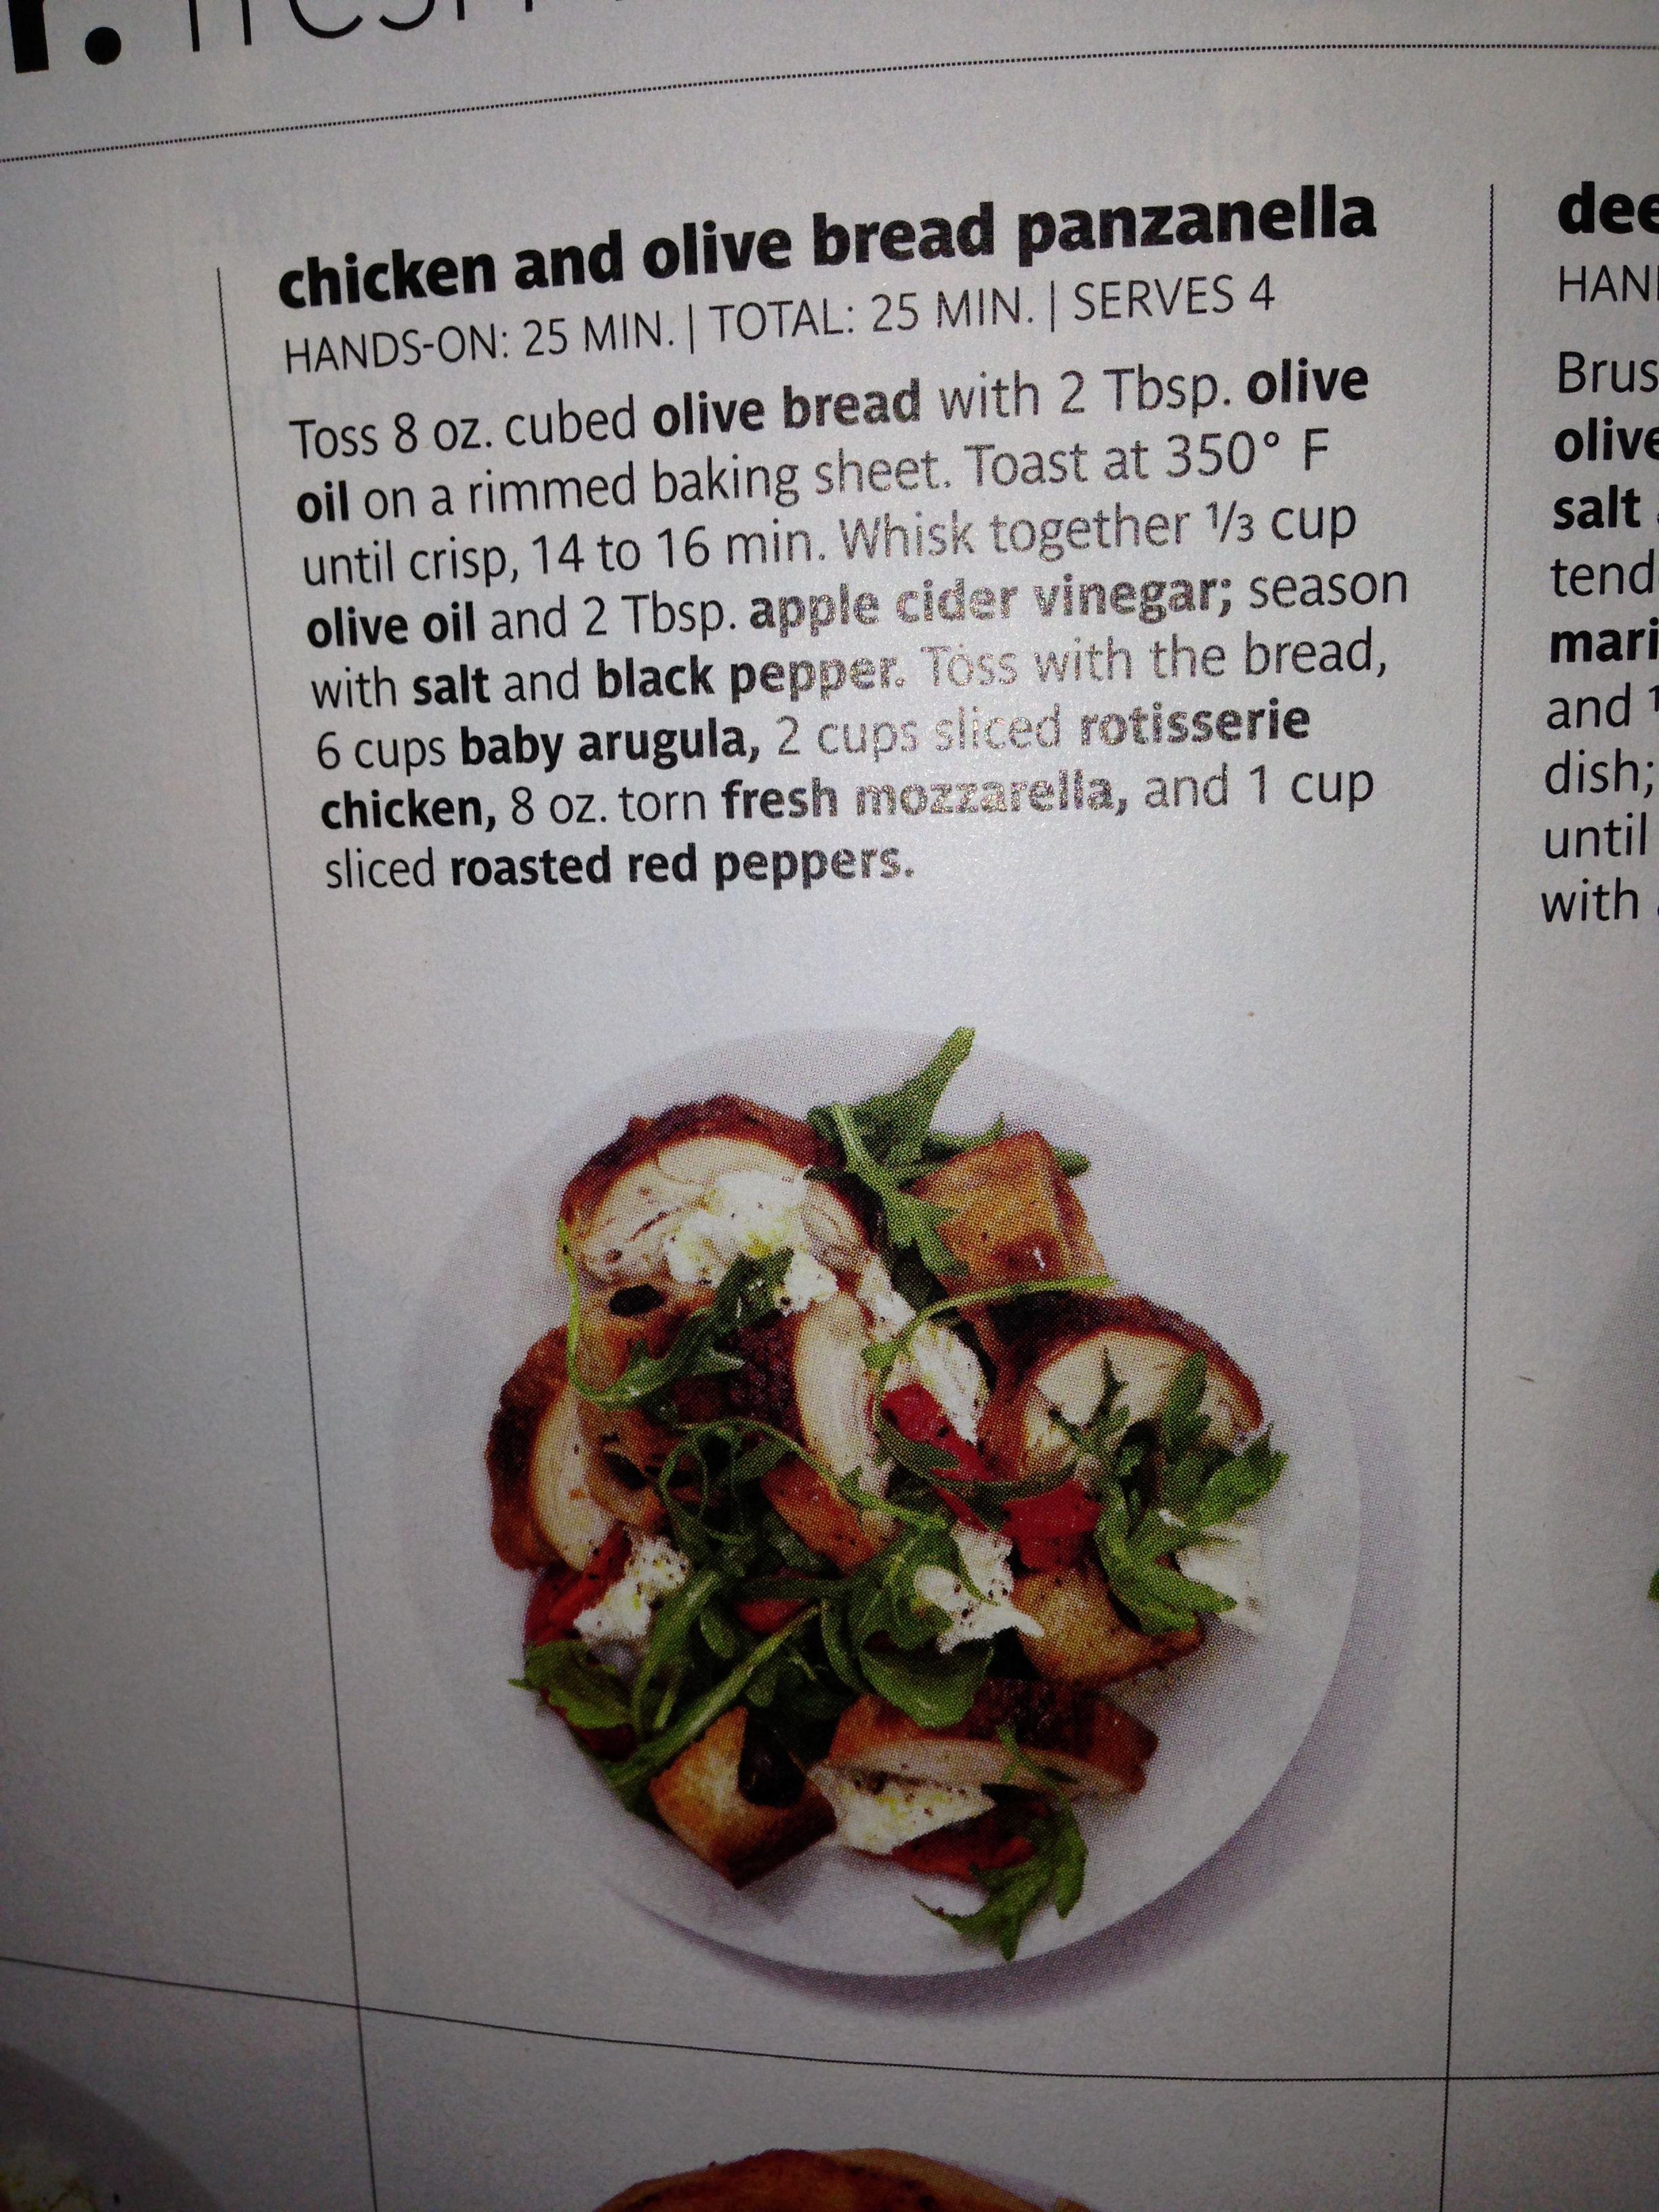 Mozzarella, Chicken and bread salad